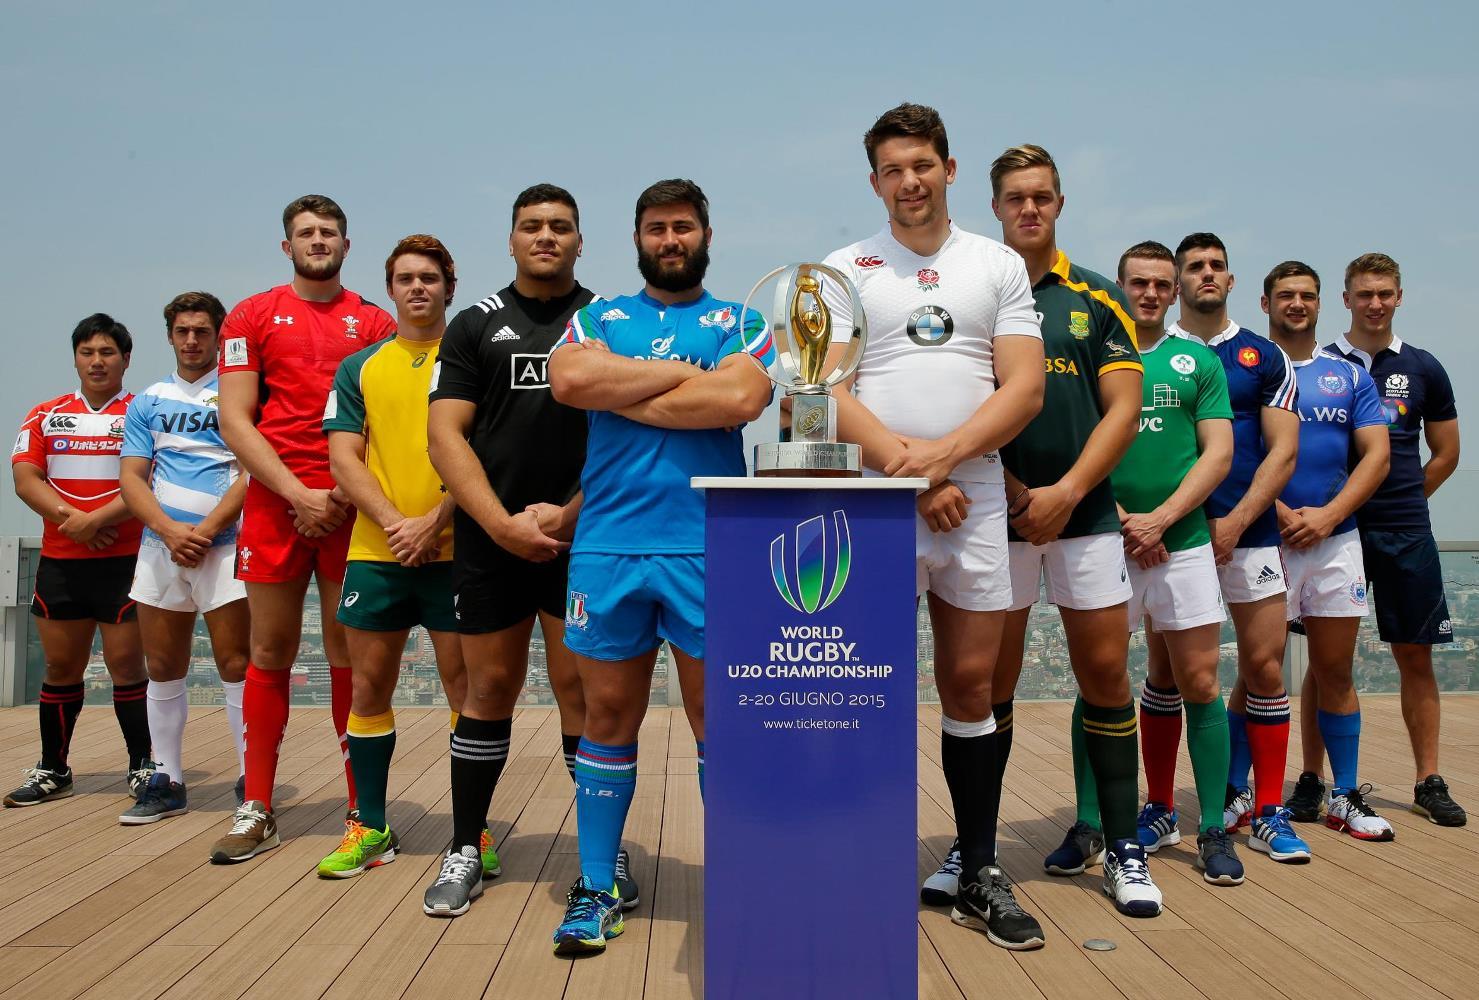 U20世界選手権に挑む各国主将(C)World Rugby, Roberto Bregani